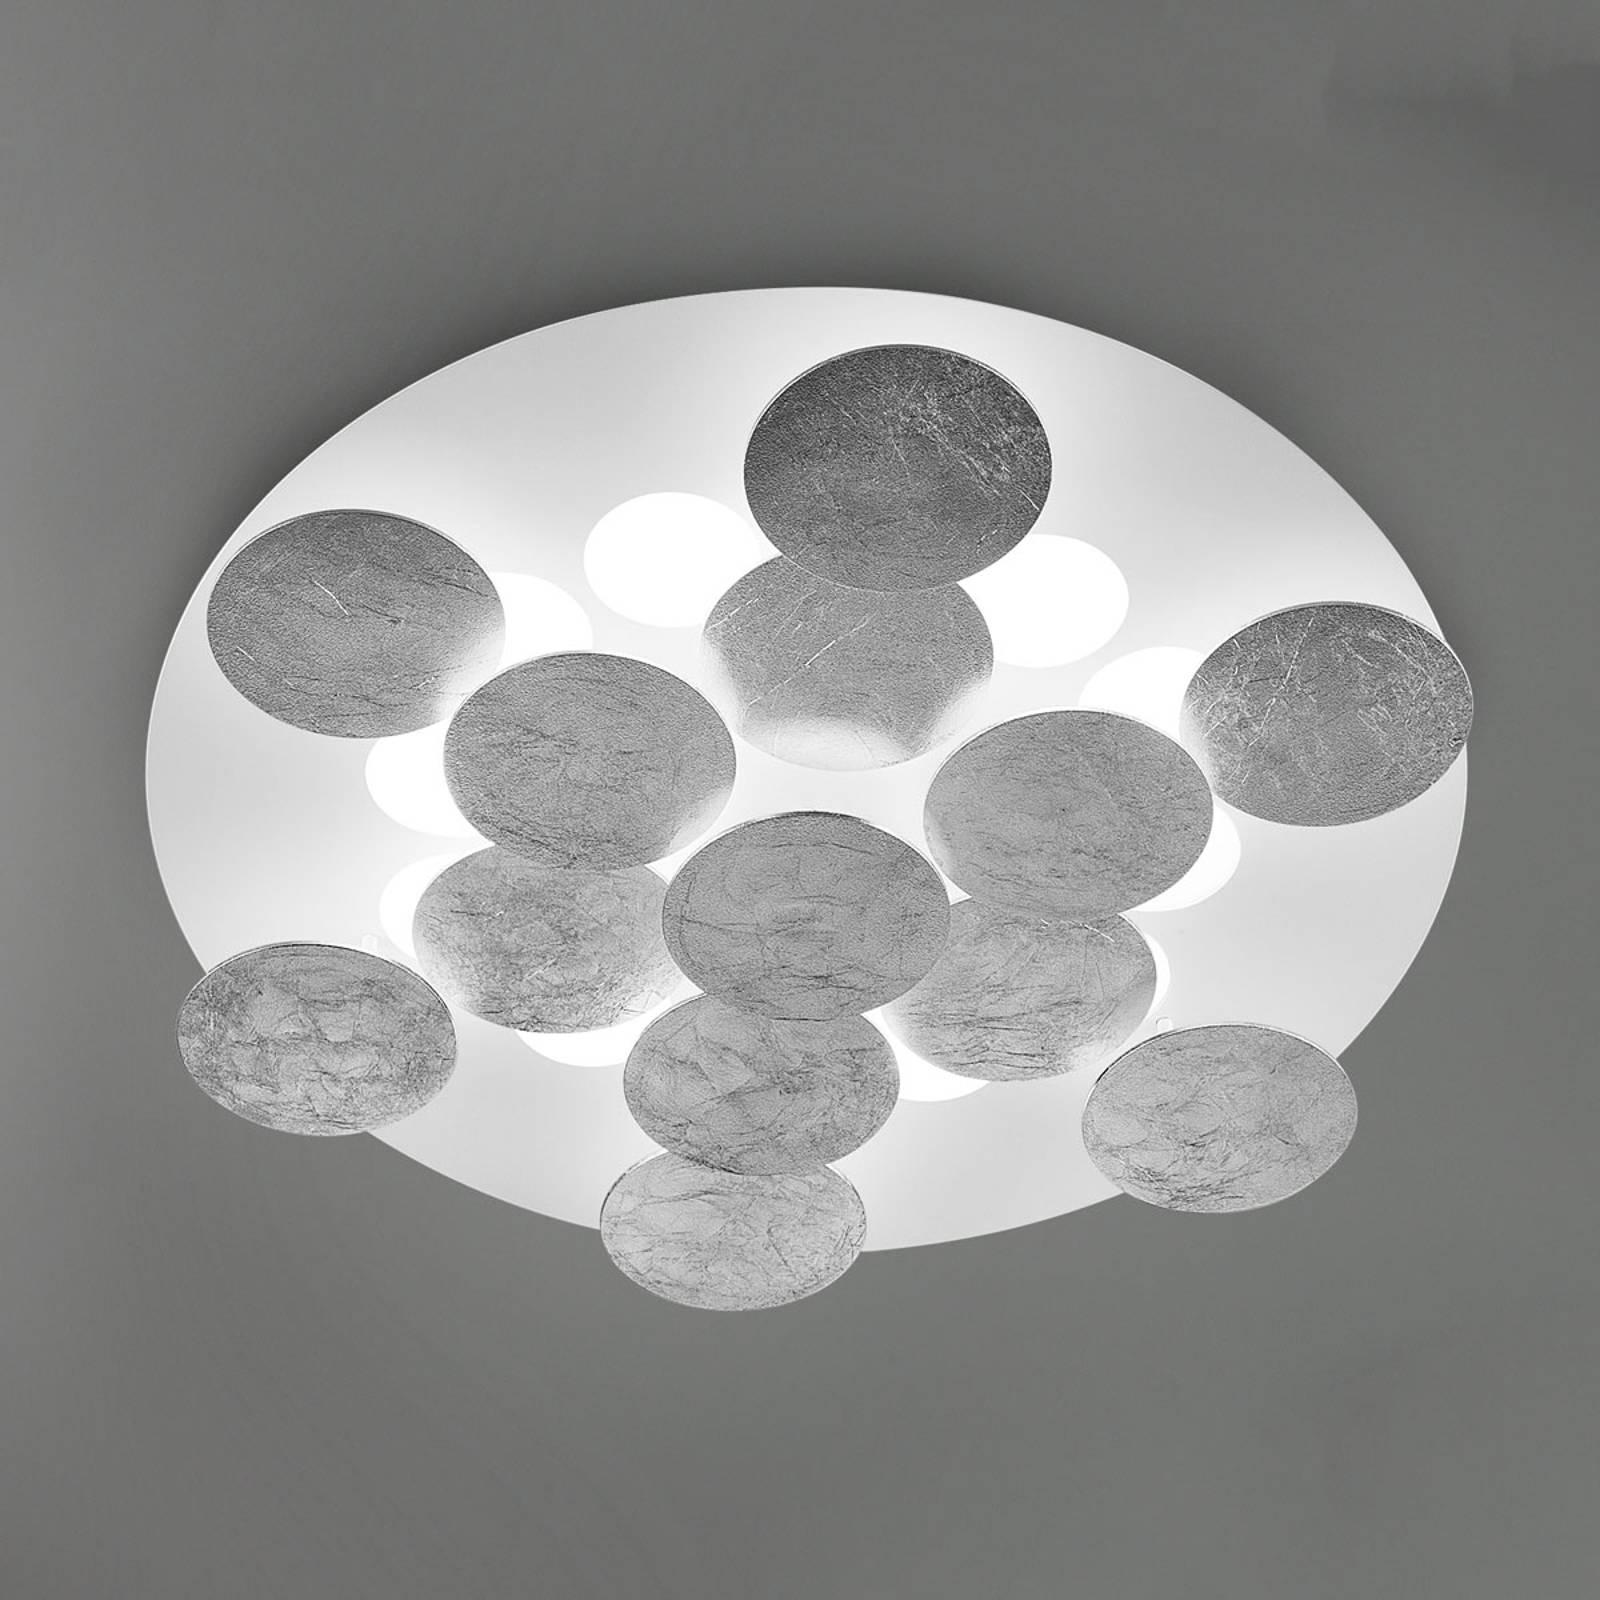 Bekleed met zilverfolie - LED plafondlamp Nuvola